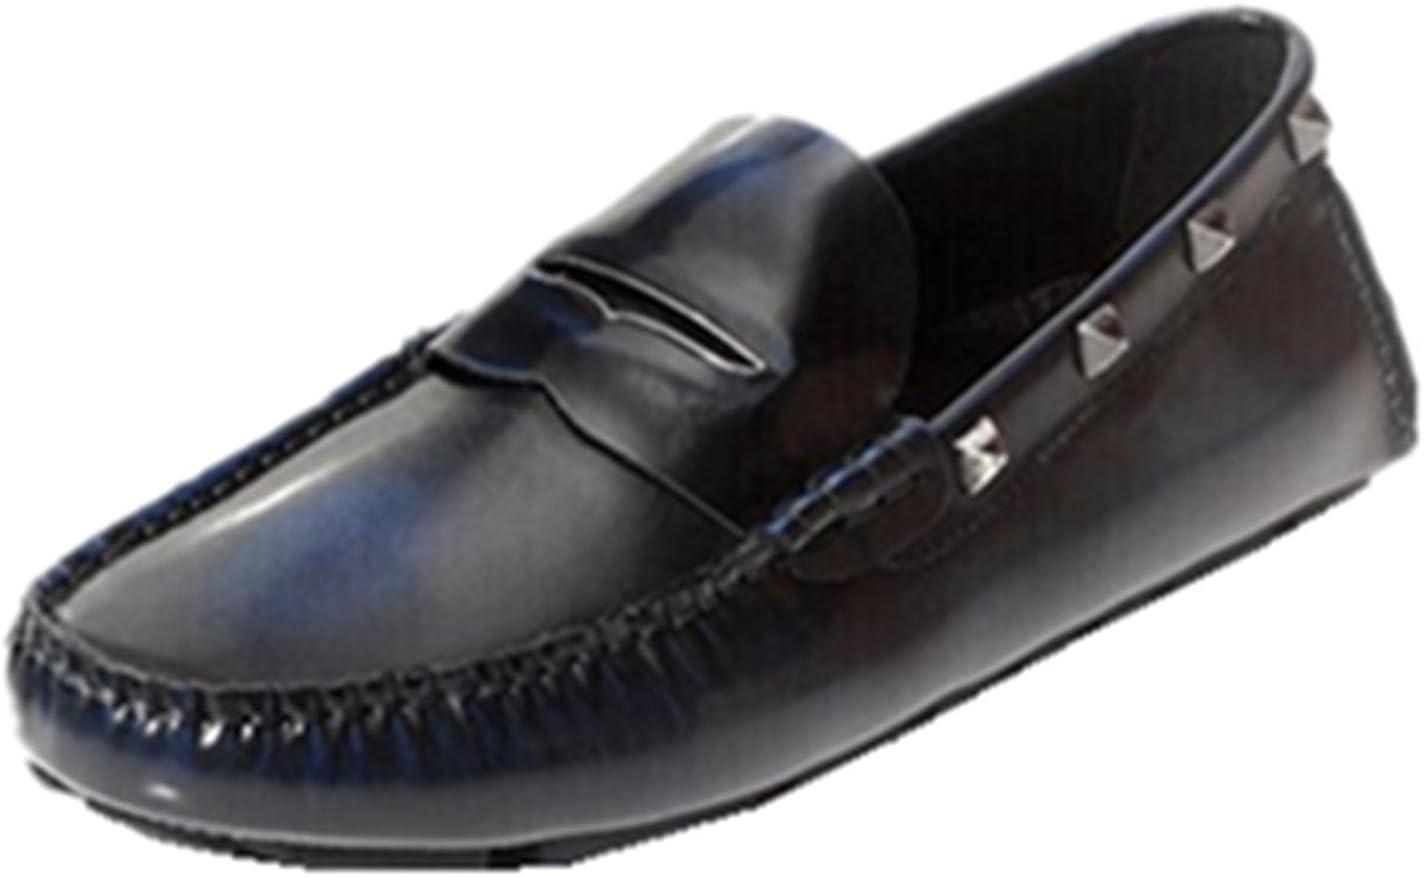 Deluxe Max 75% OFF HAPPYSHOP TM Men's Genuine Leather Polishing Slip-on Drivi Color